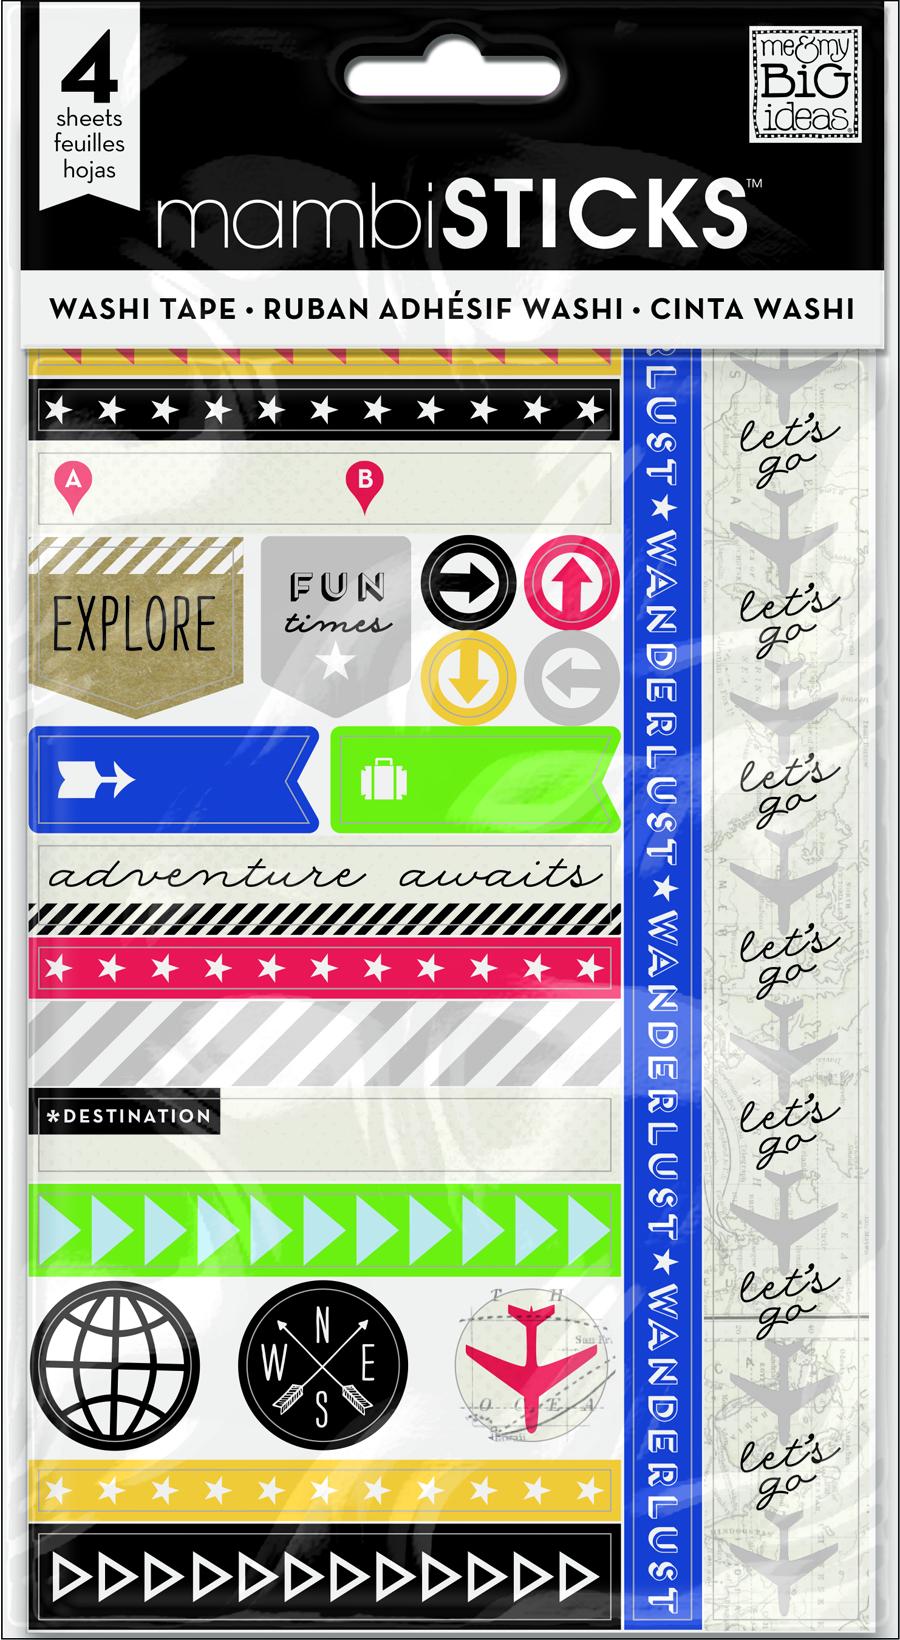 'Let's Go' washi tape mambiSTICKS stickers   me & my BIG ideas.jpg